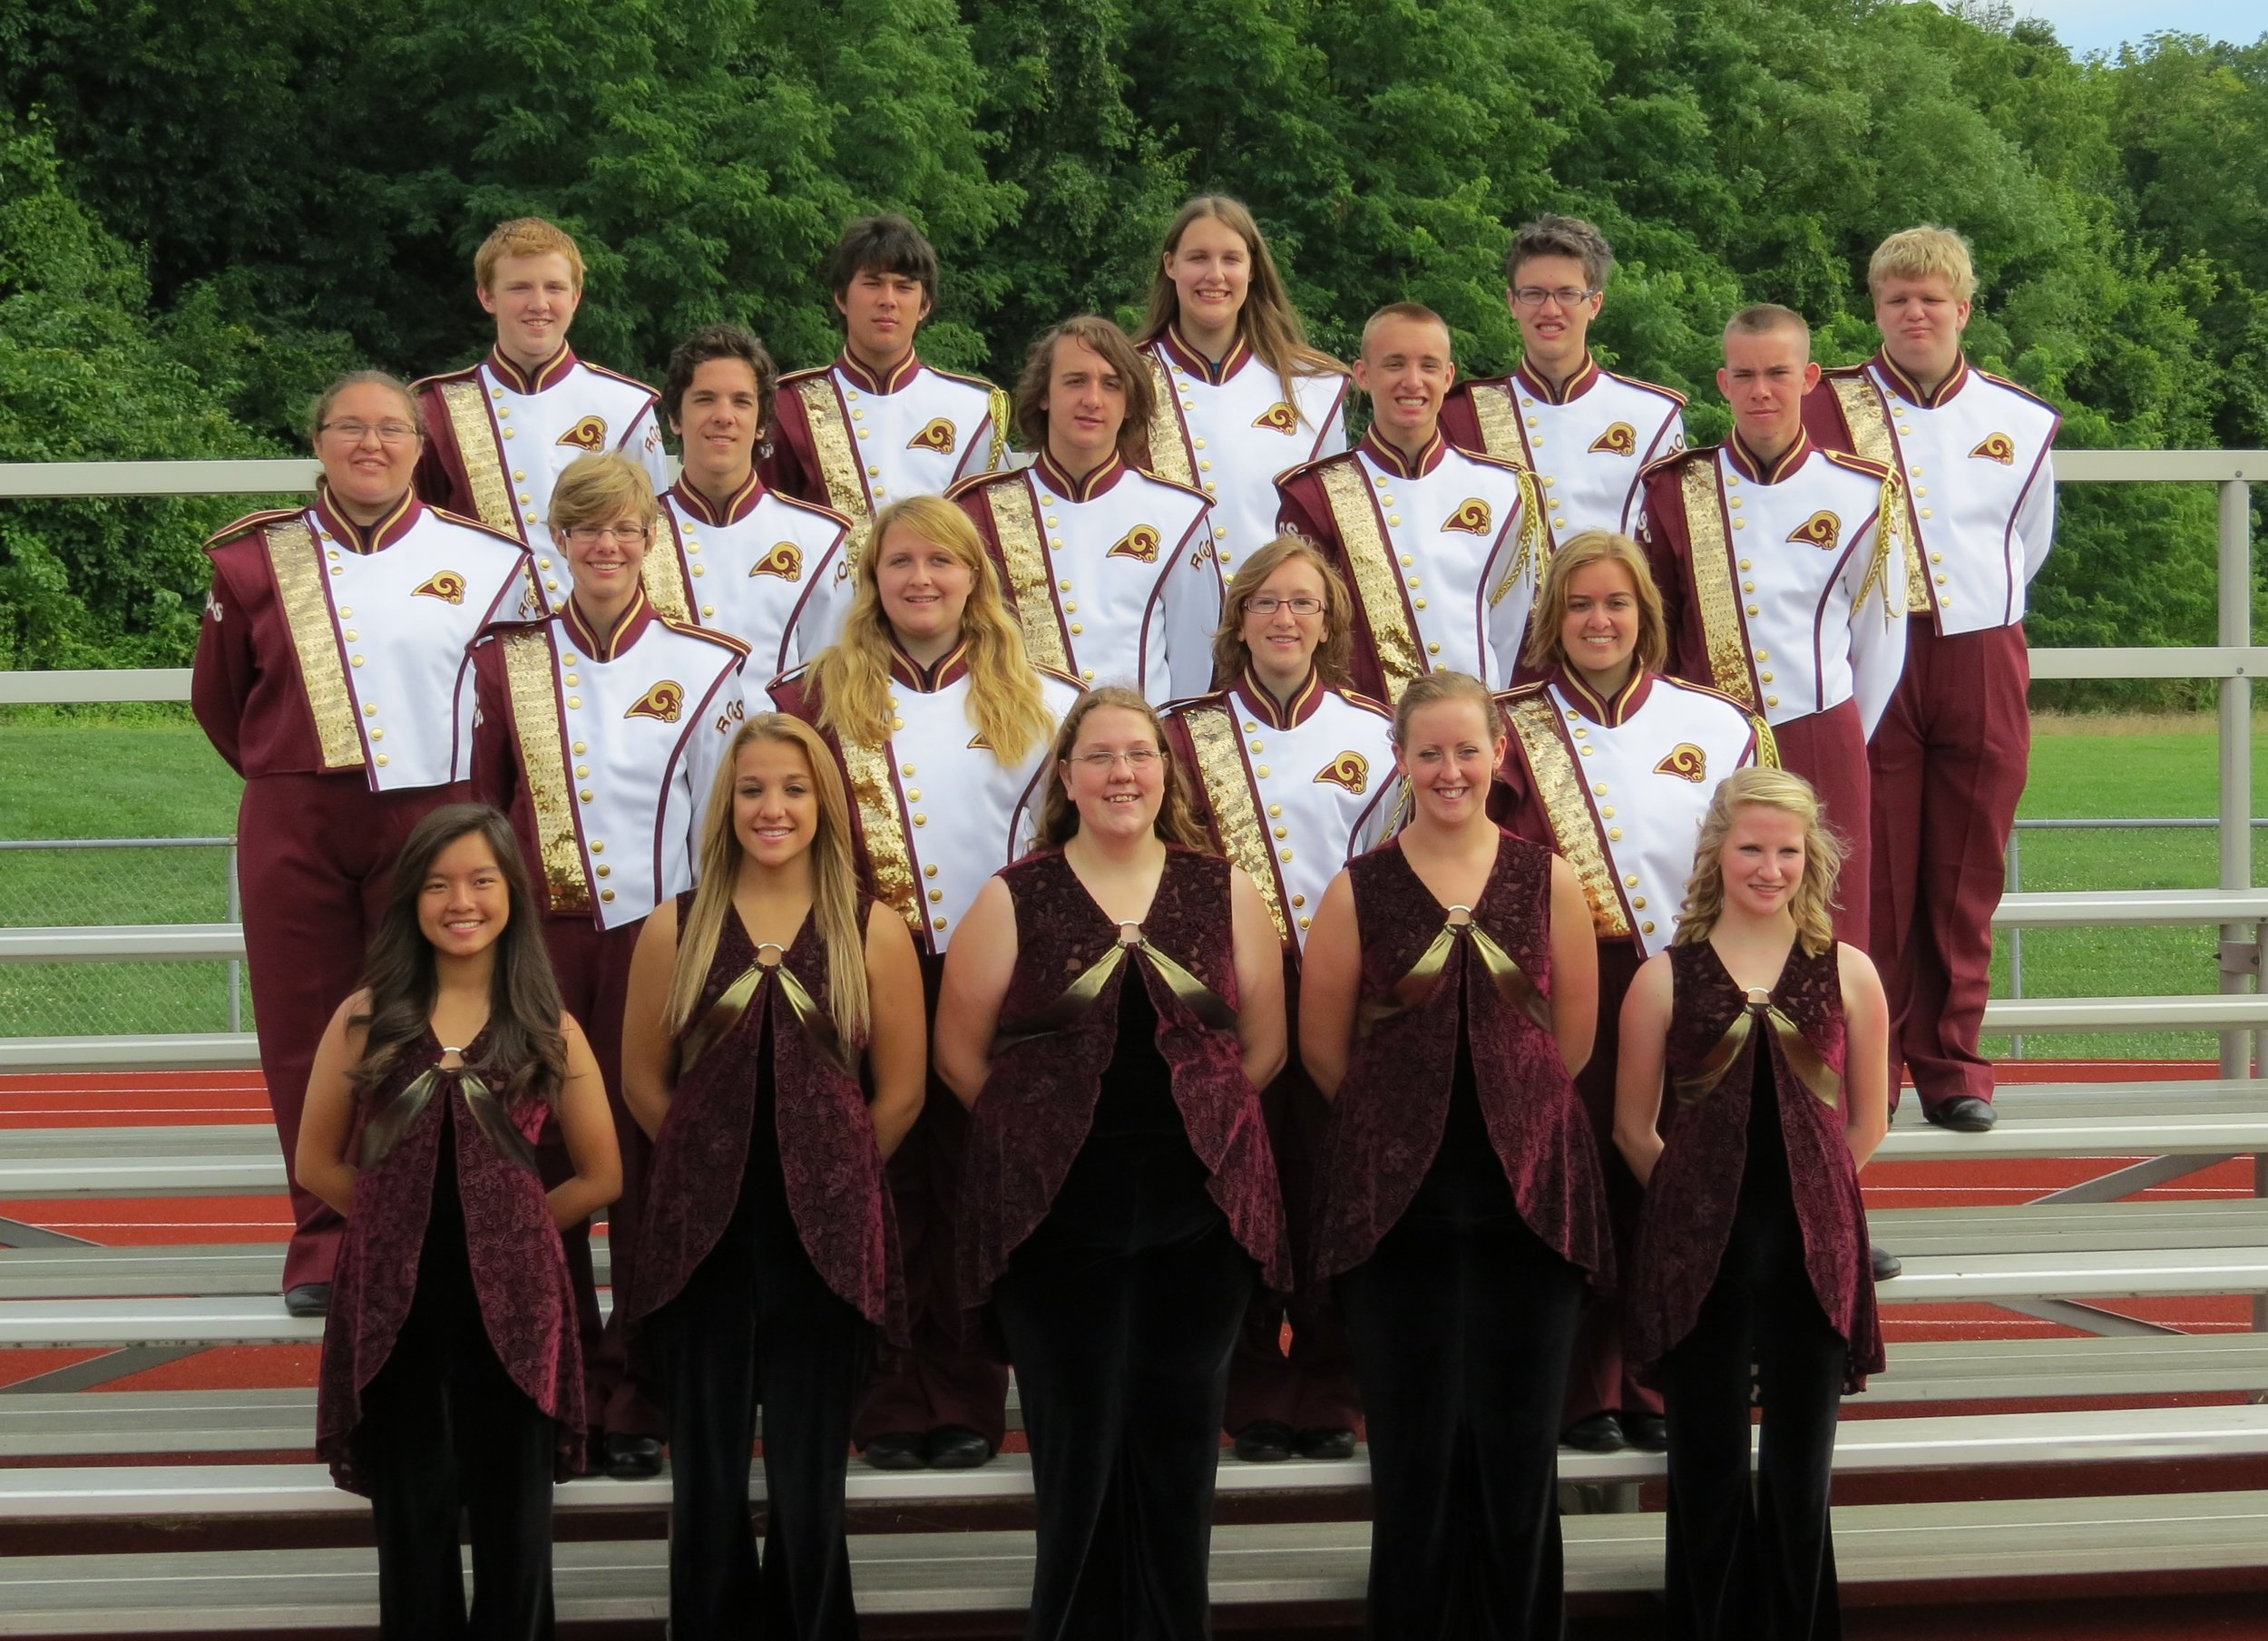 Seniors 2013-2014